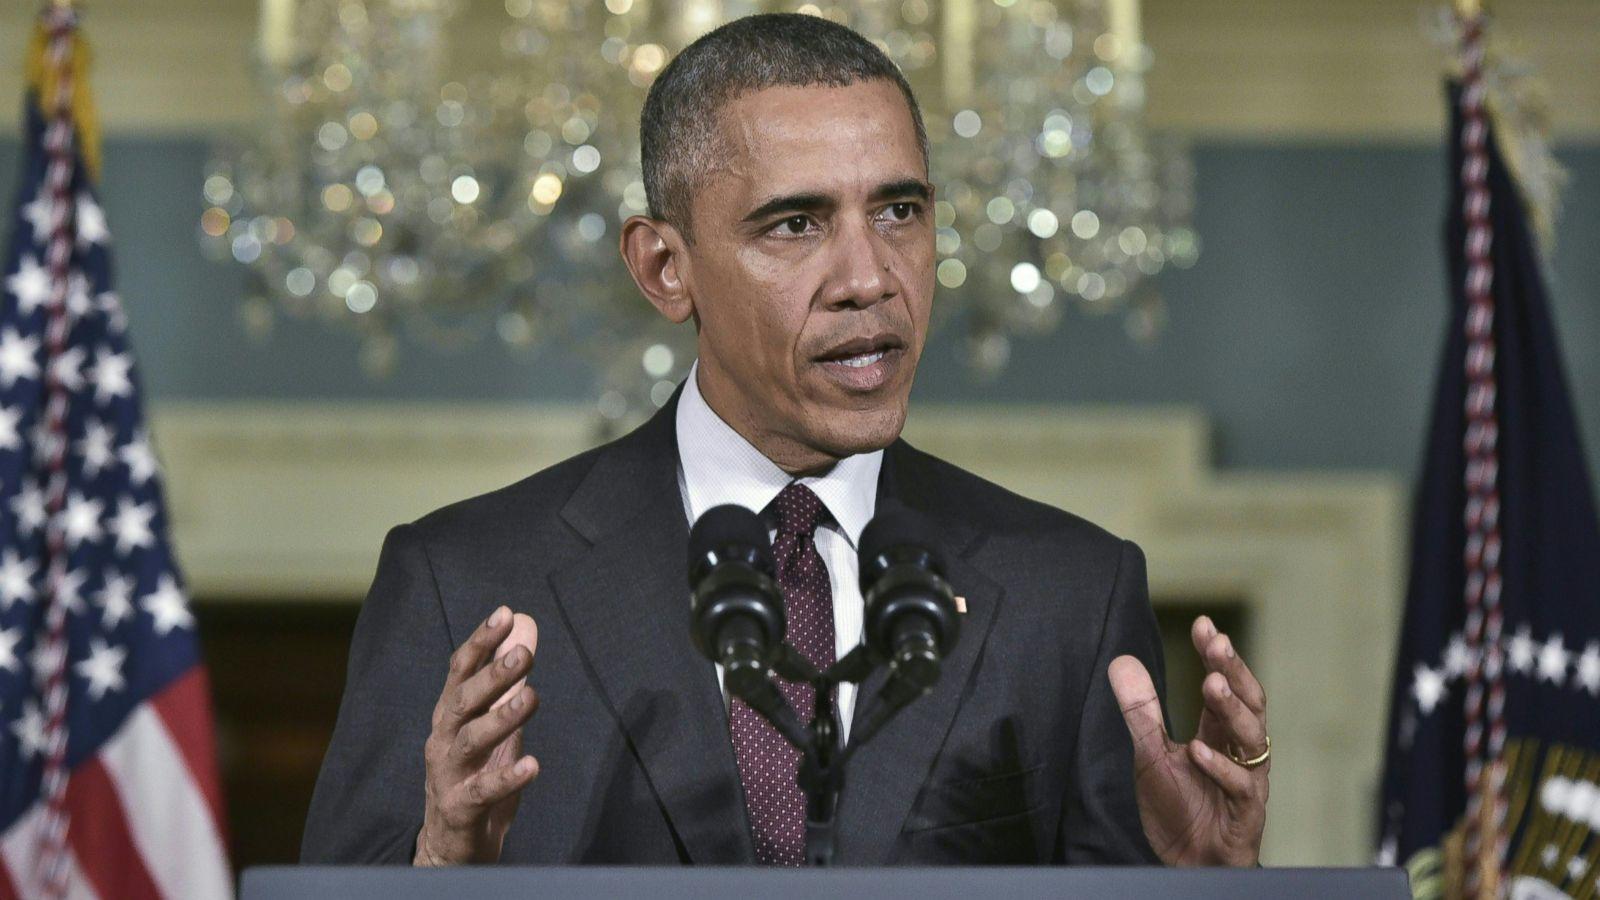 Obama Prolongs Sanctions on Russia Over Ukraine Crisis - ABC News